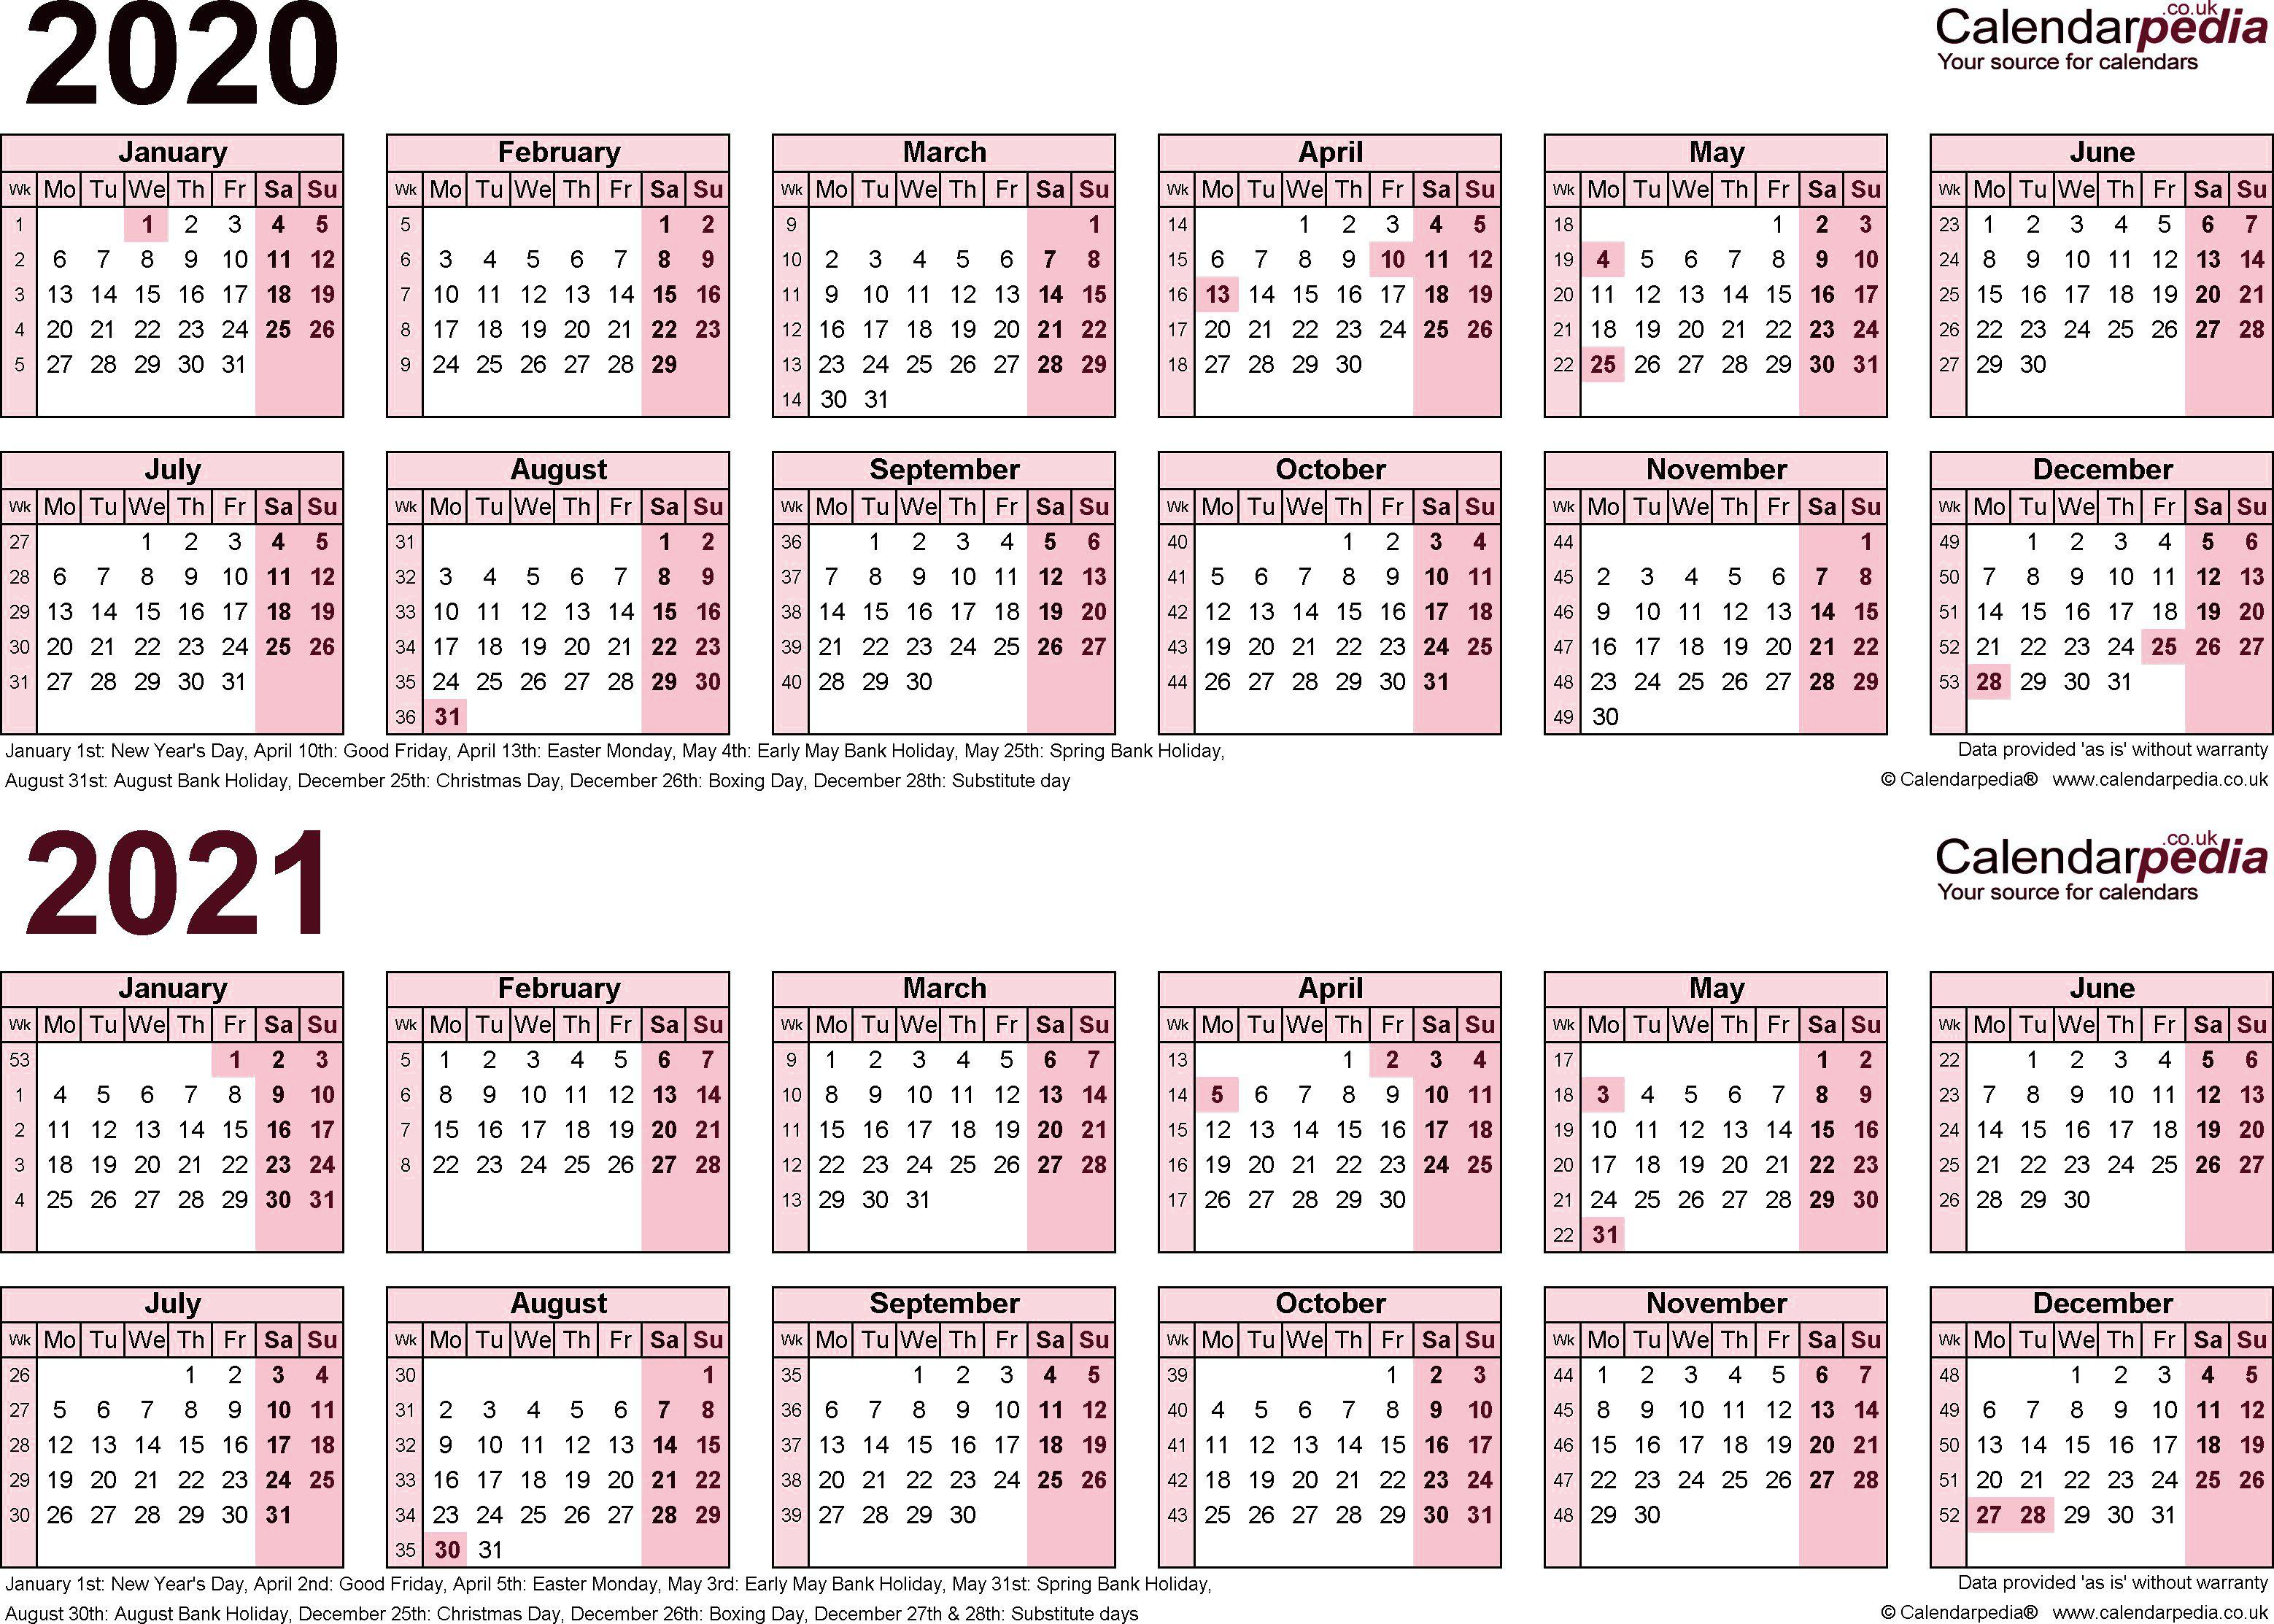 2021 Biweekly Payroll Calendar Template Payroll Calendar Template 2020 ~ Addictionary